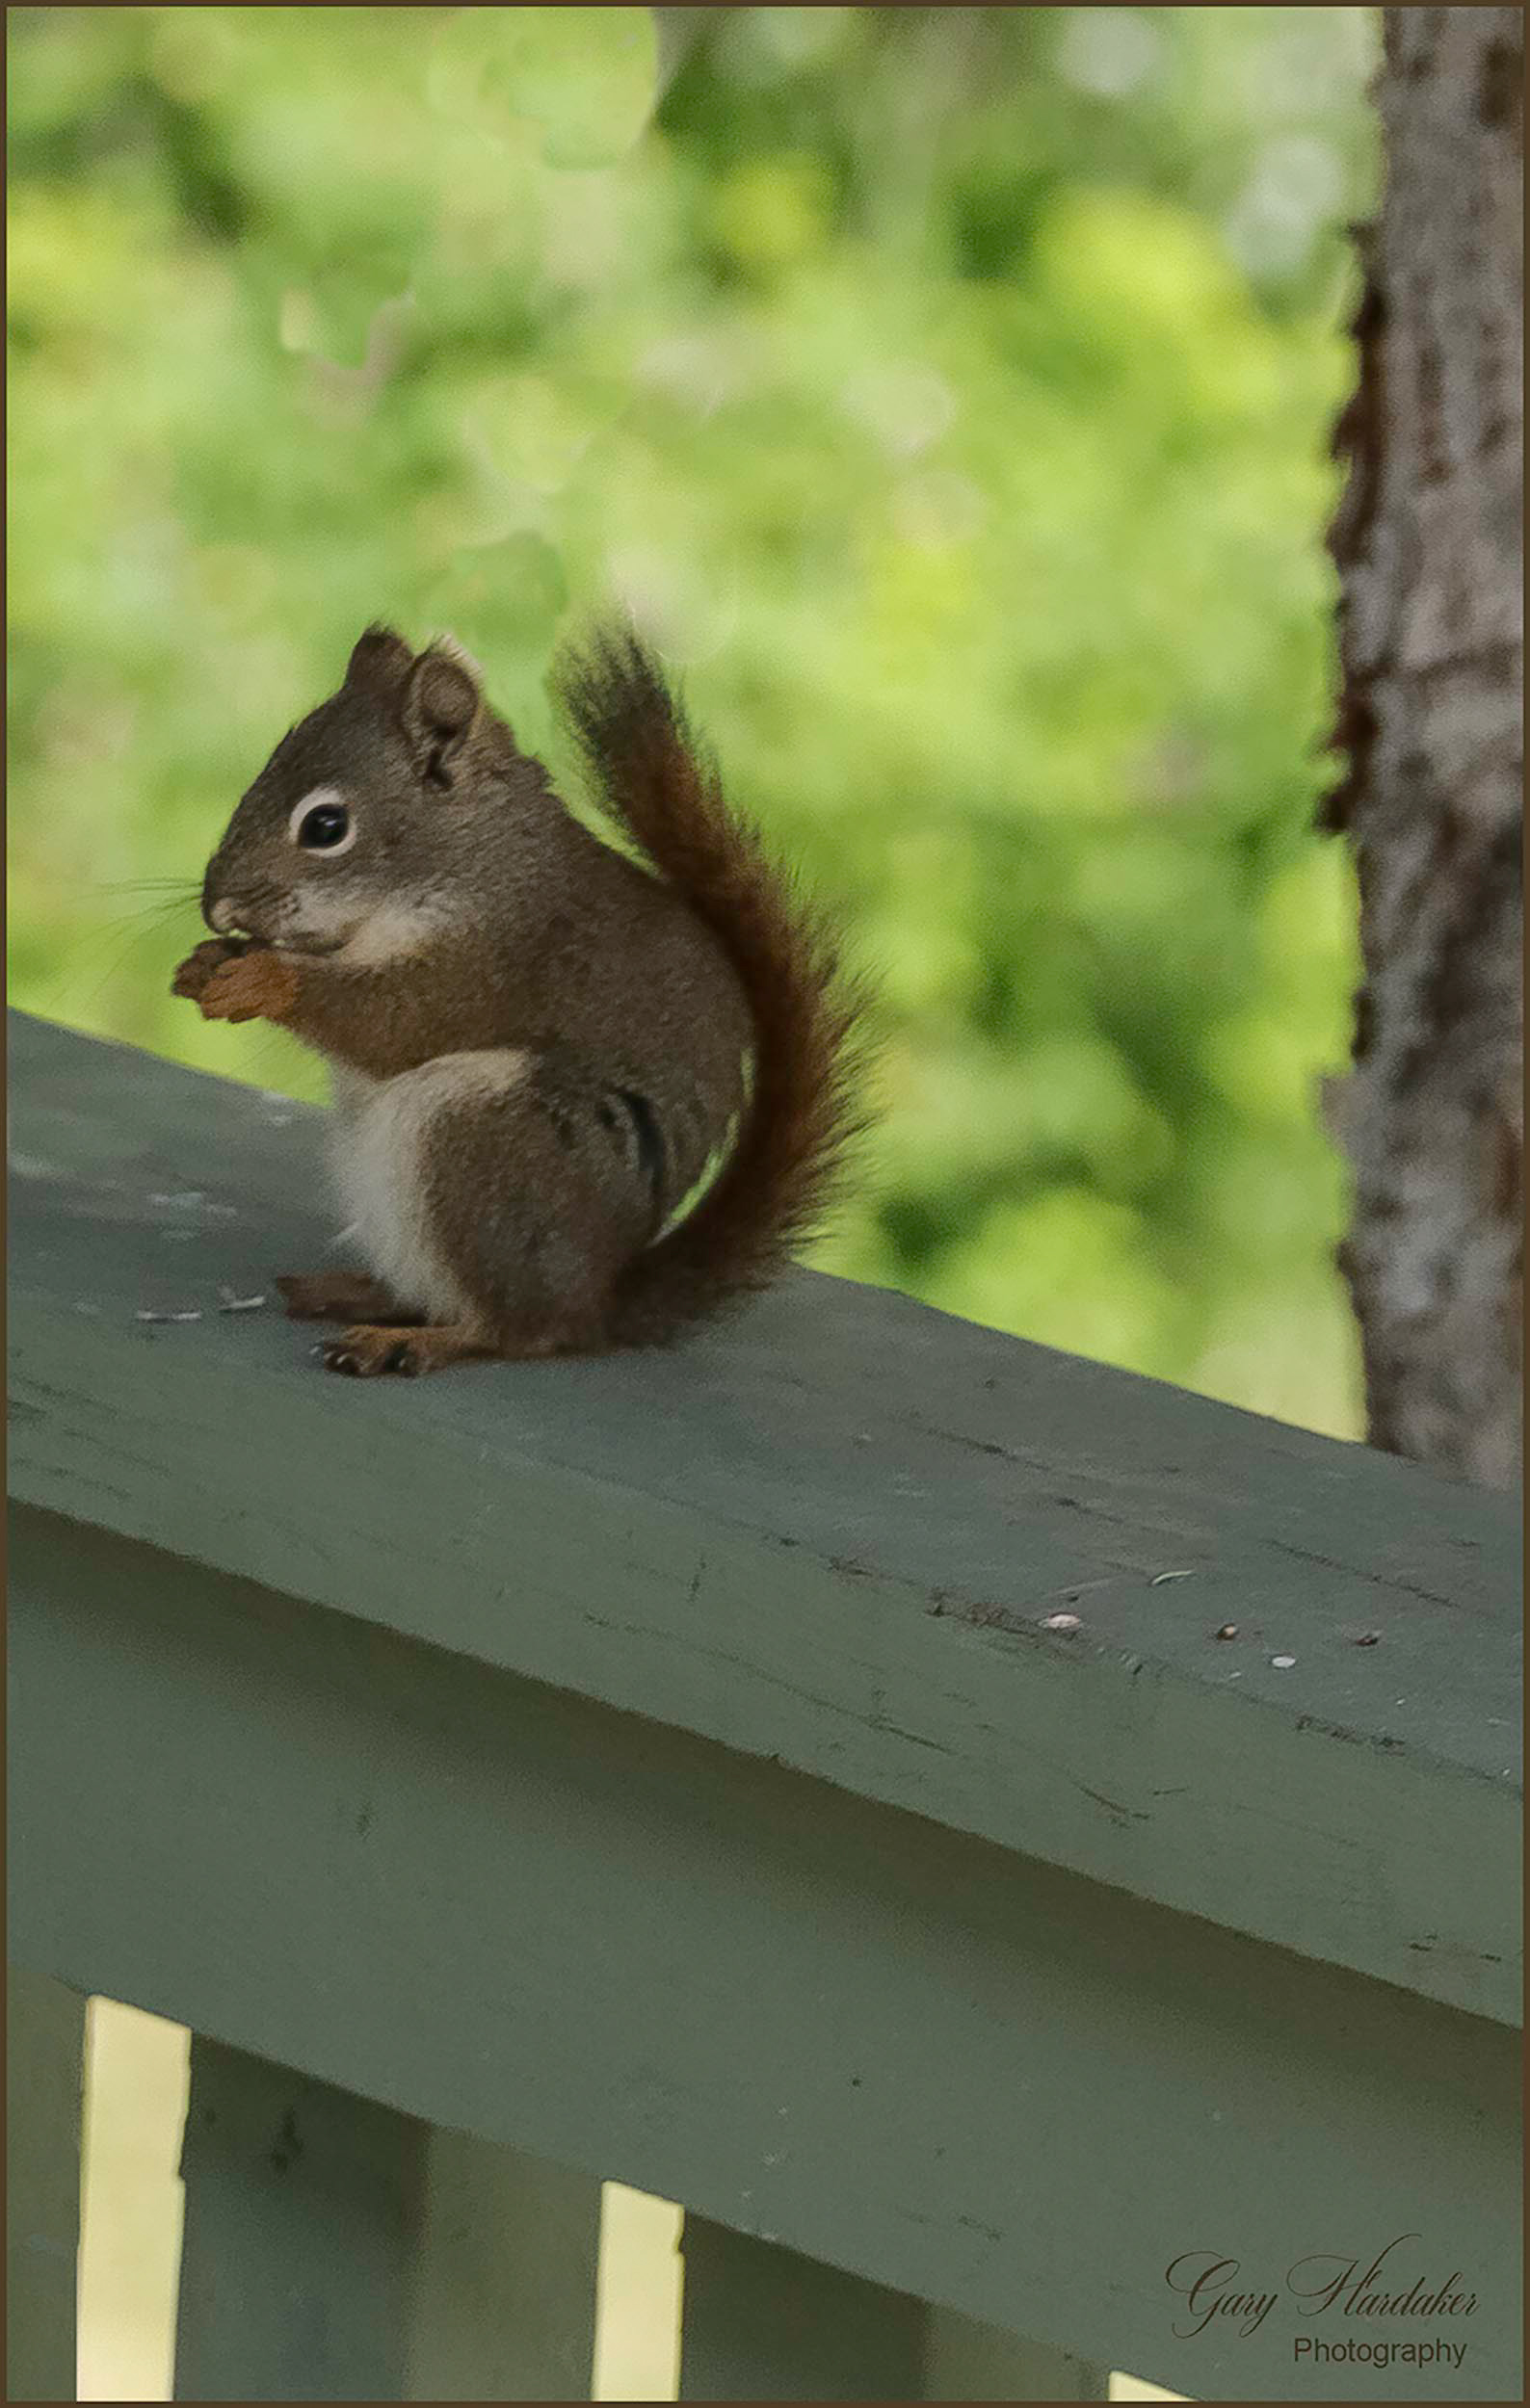 Squirrel dining on bird seed- Gary Hardaker